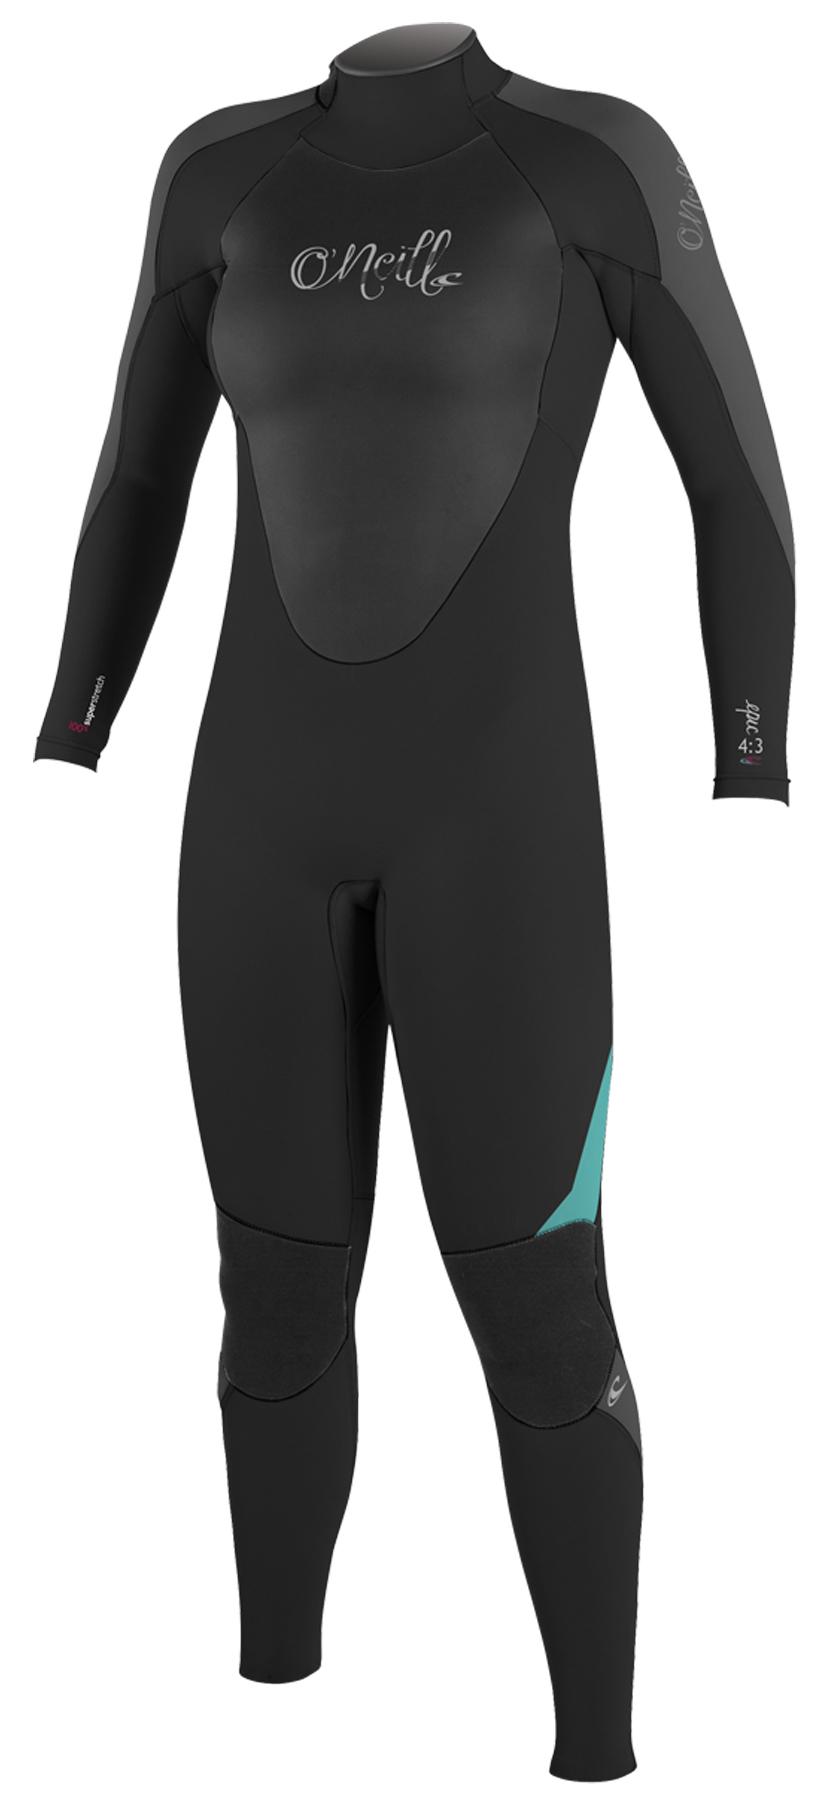 oneil-epic-ladies-wetsuit